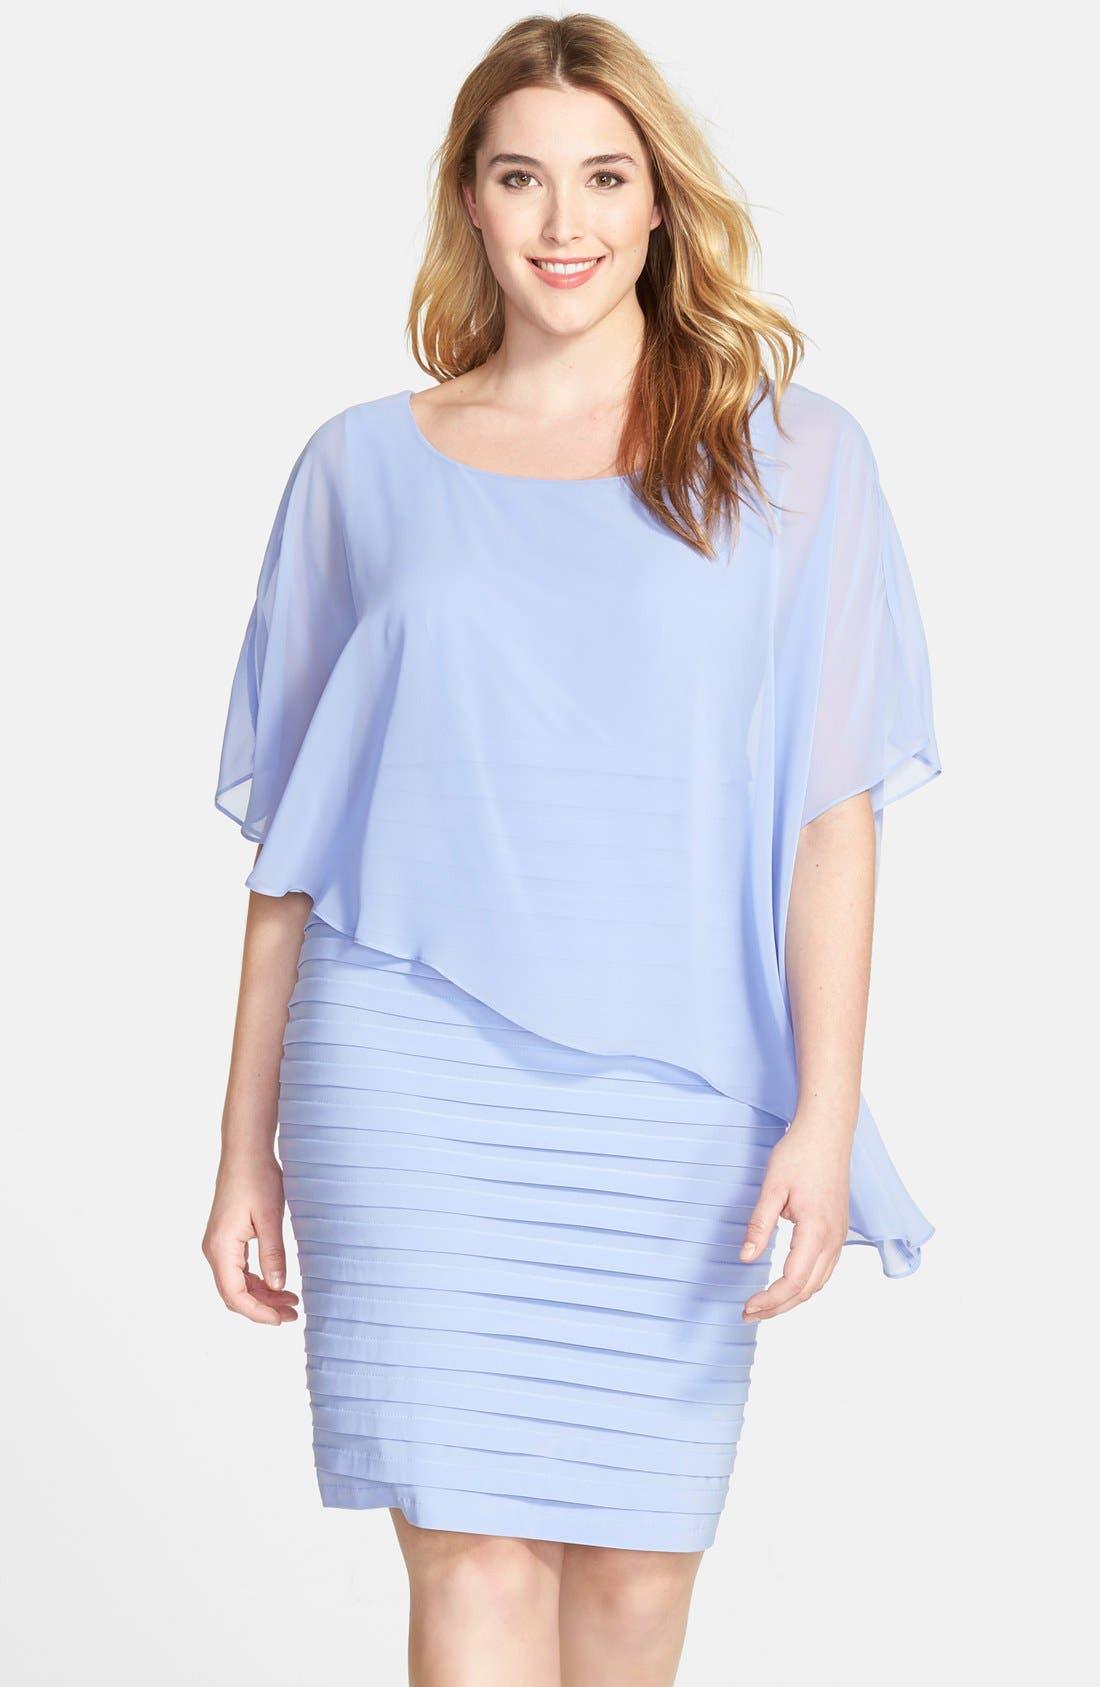 Alternate Image 1 Selected - Adrianna Papell Chiffon Overlay Shutter Pleat Sheath Dress (Plus Size)